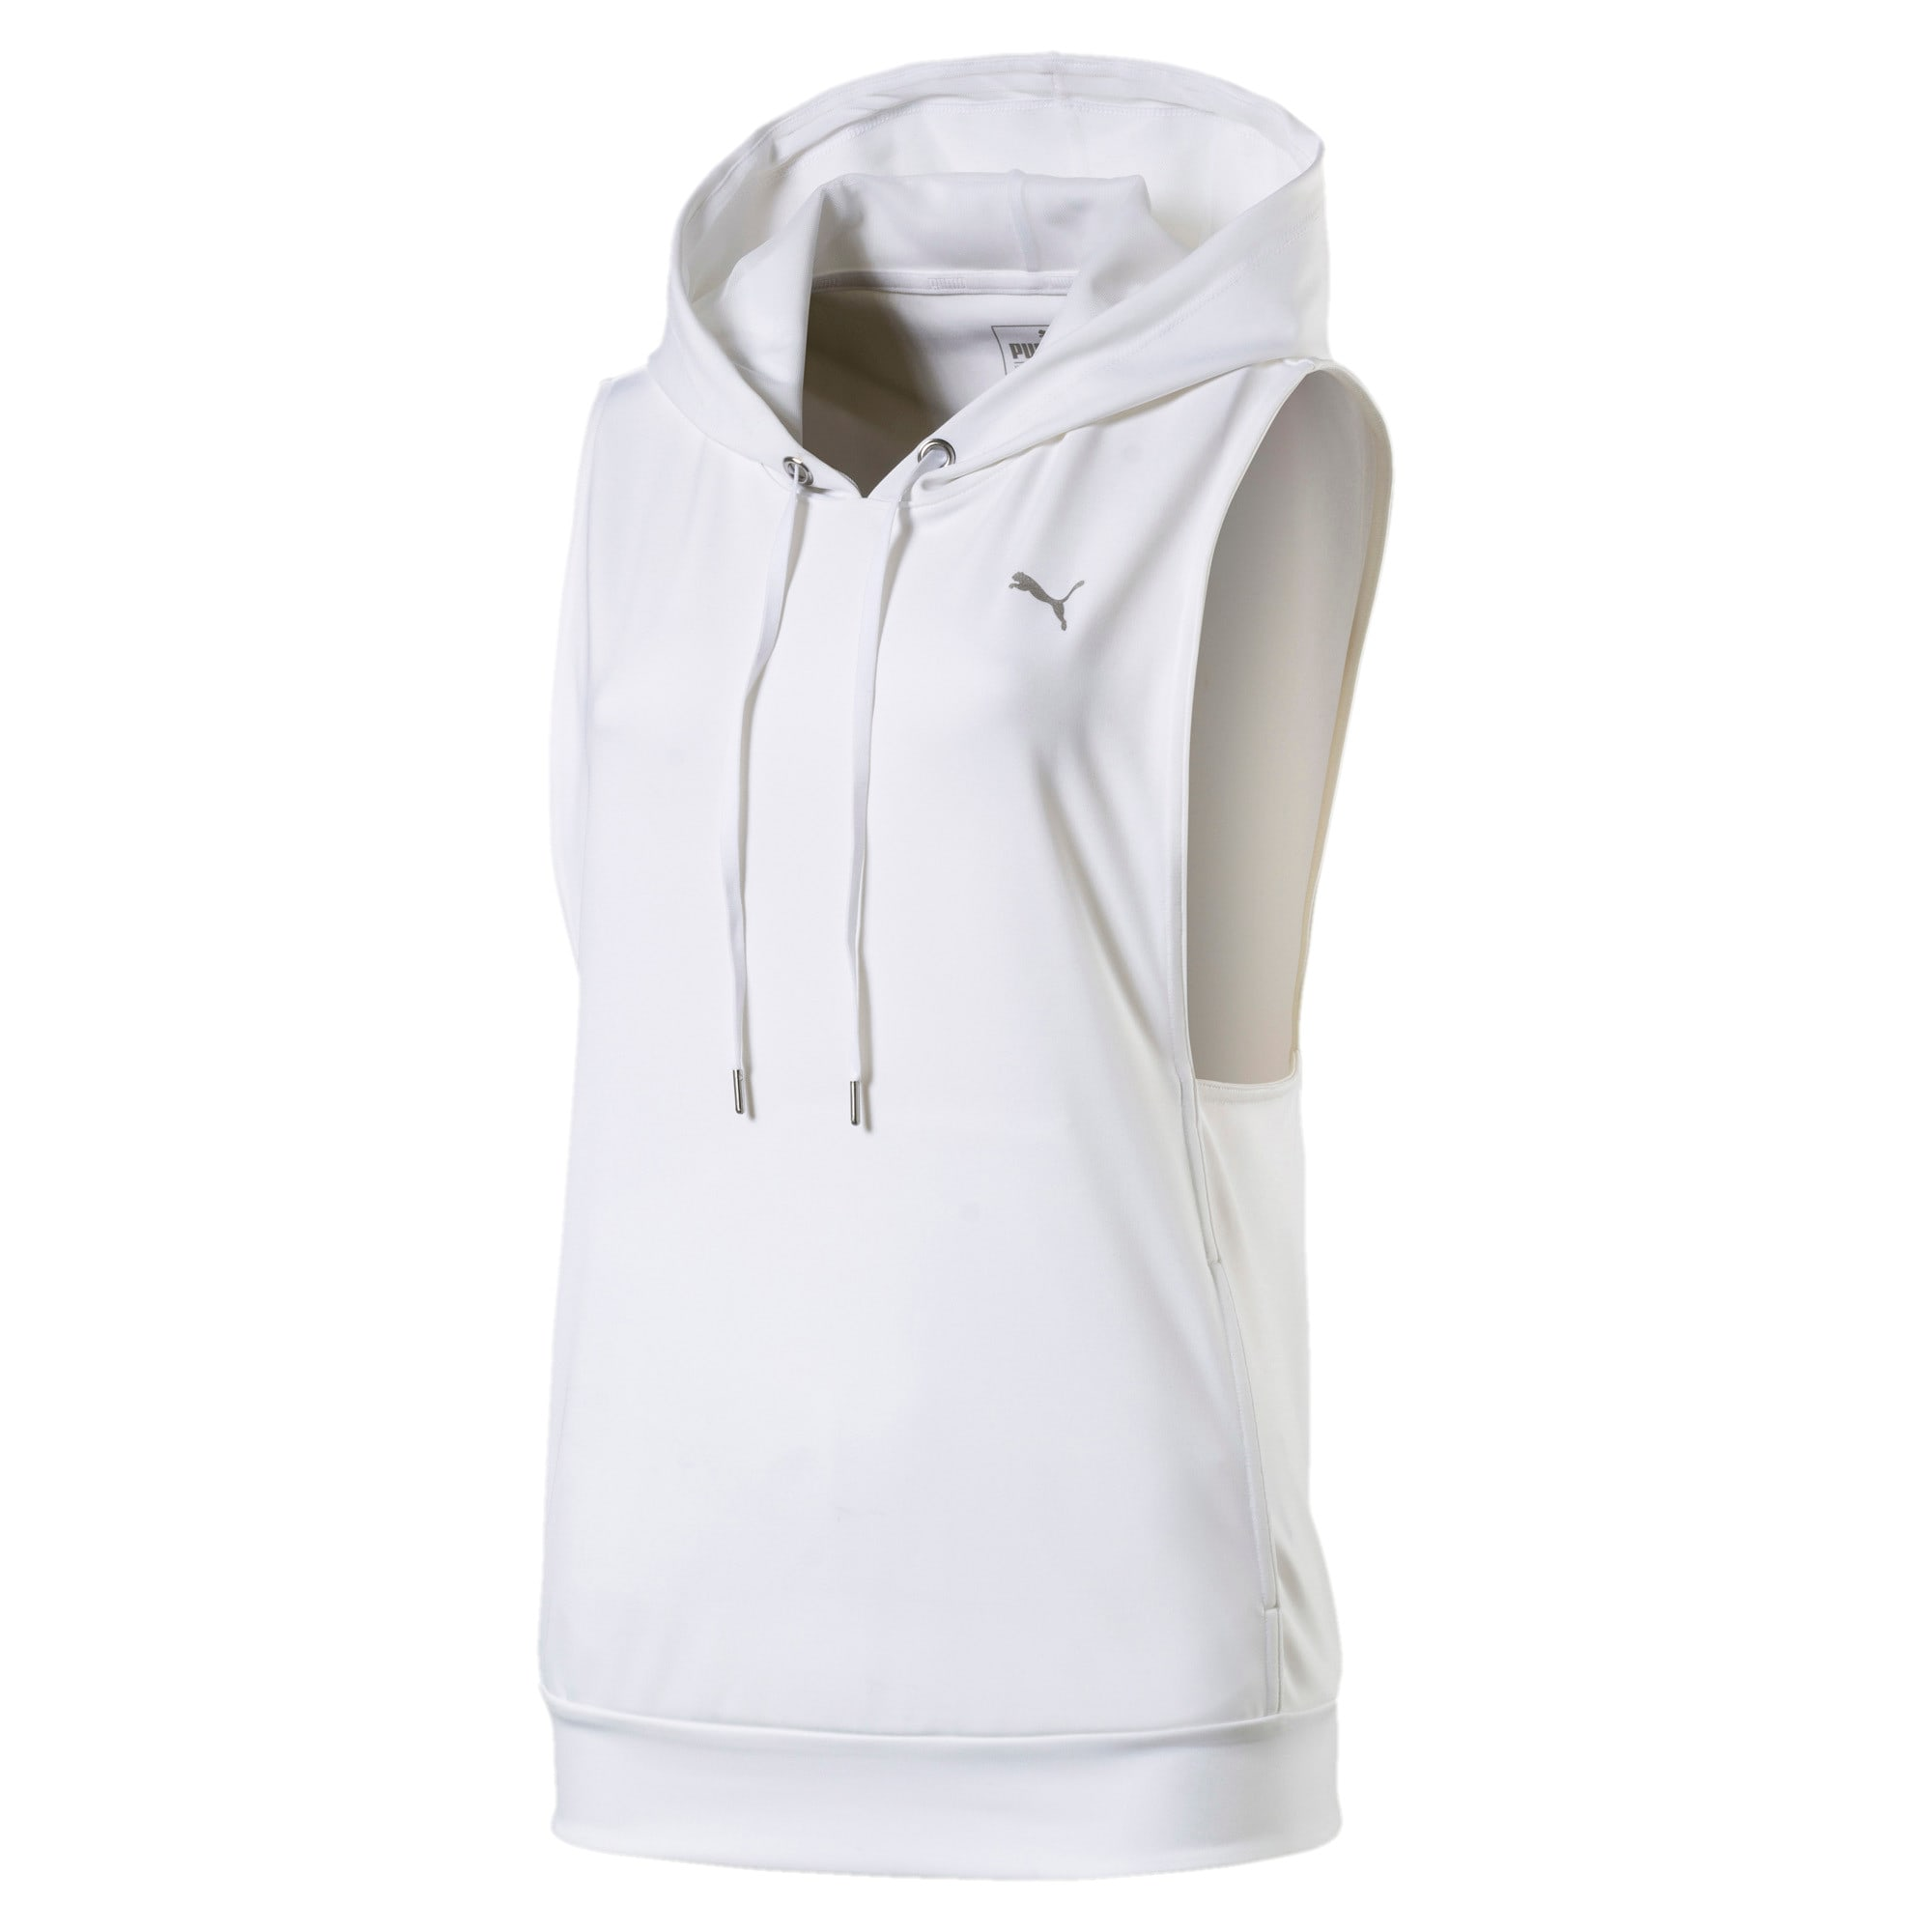 Thumbnail 1 of Clash Women's Vest, Puma White, medium-IND